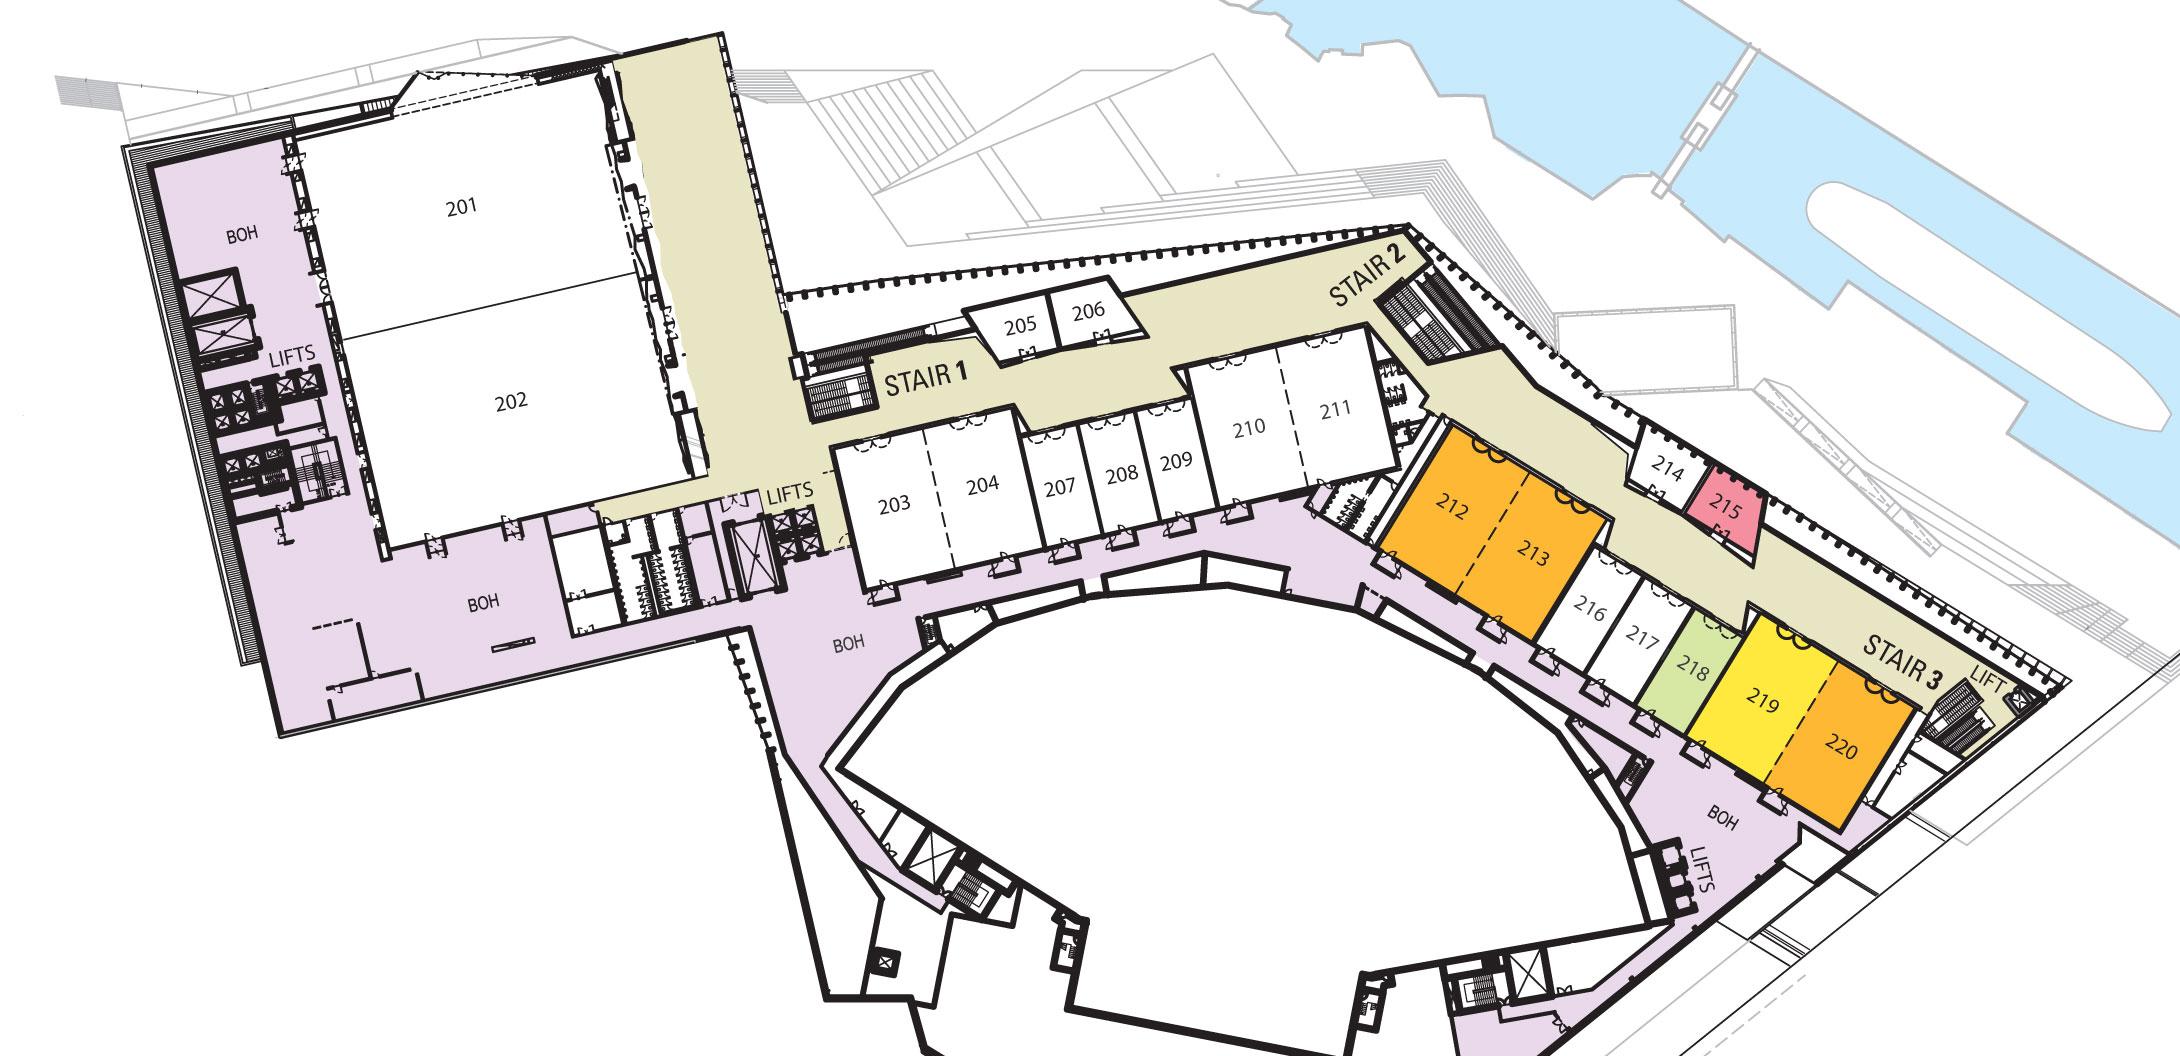 VALA2014 break out room floor plan